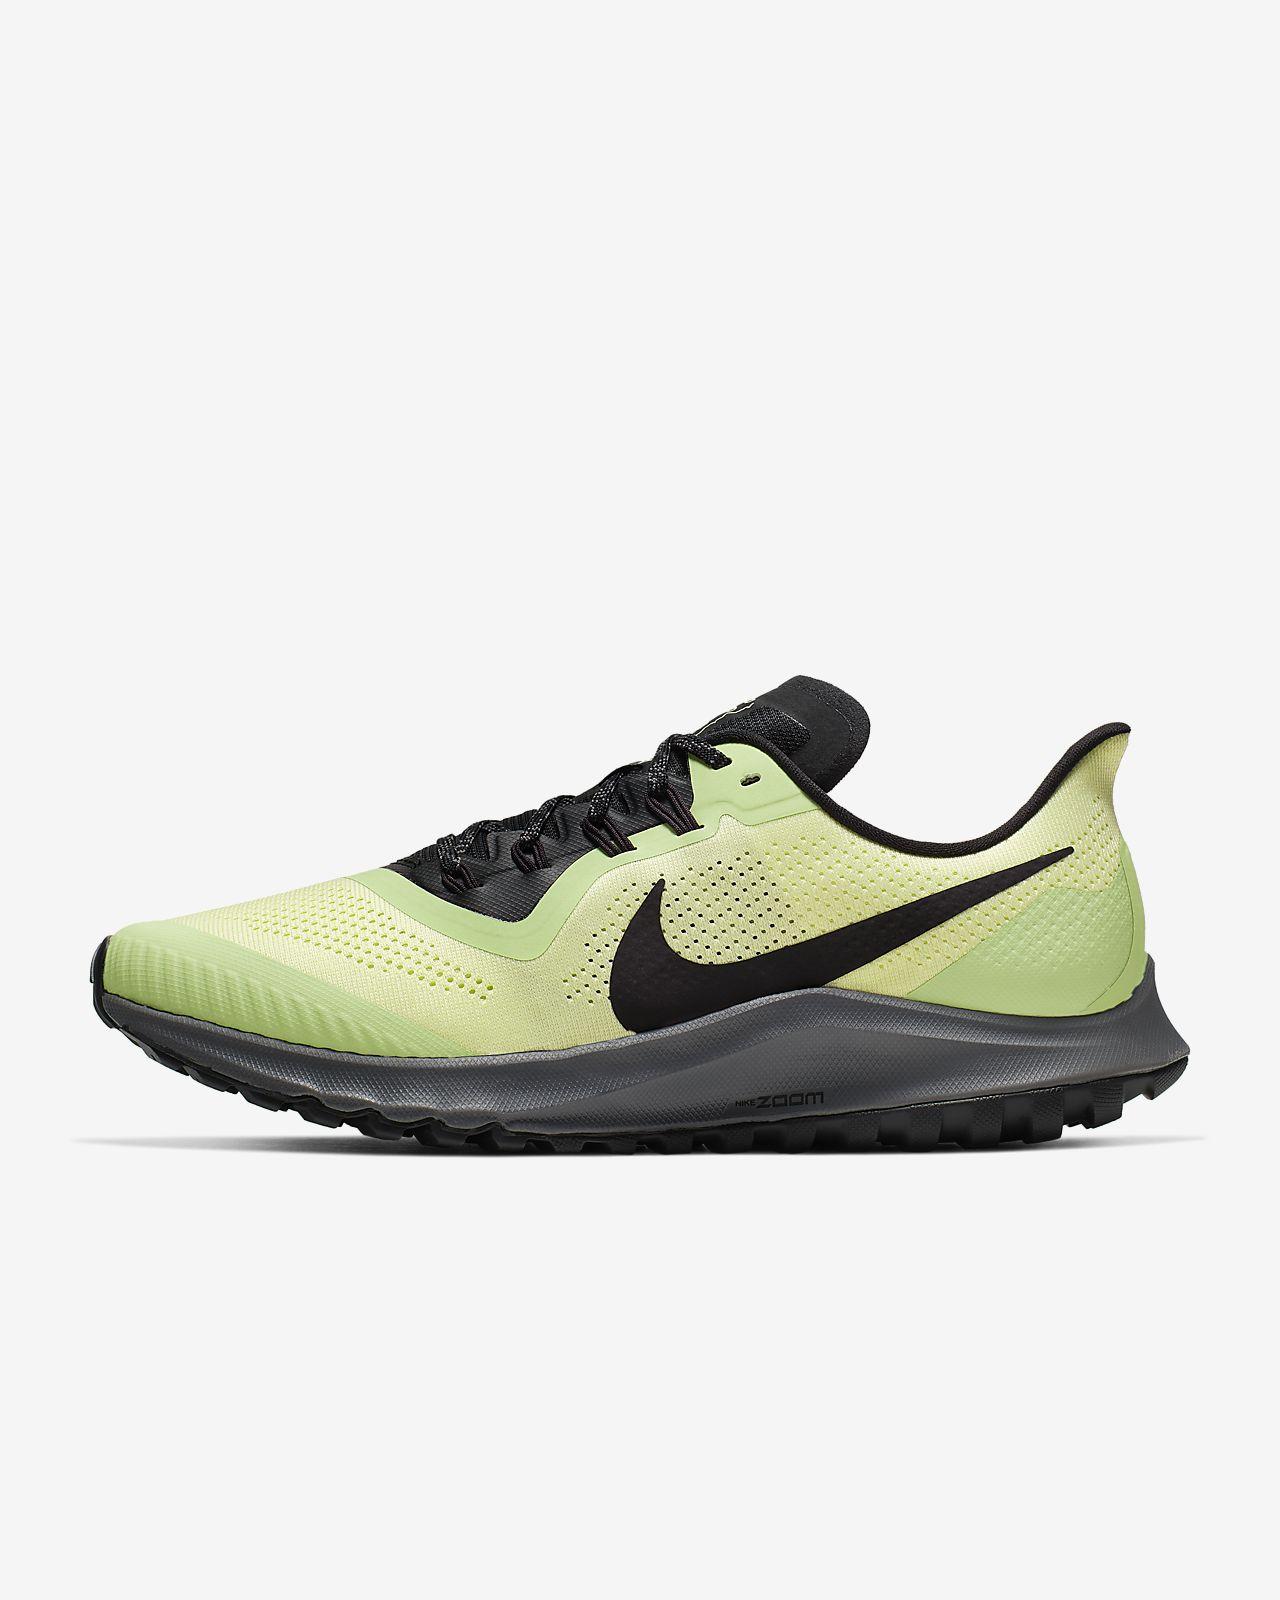 meilleures baskets b5460 85291 Nike Air Zoom Pegasus 36 Trail Men's Running Shoe